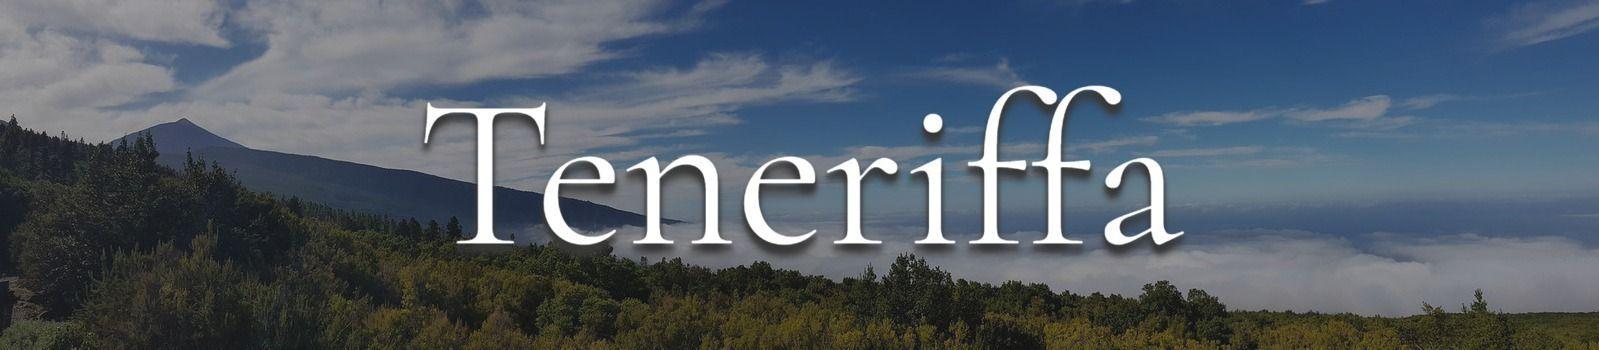 Teneriffa Banner